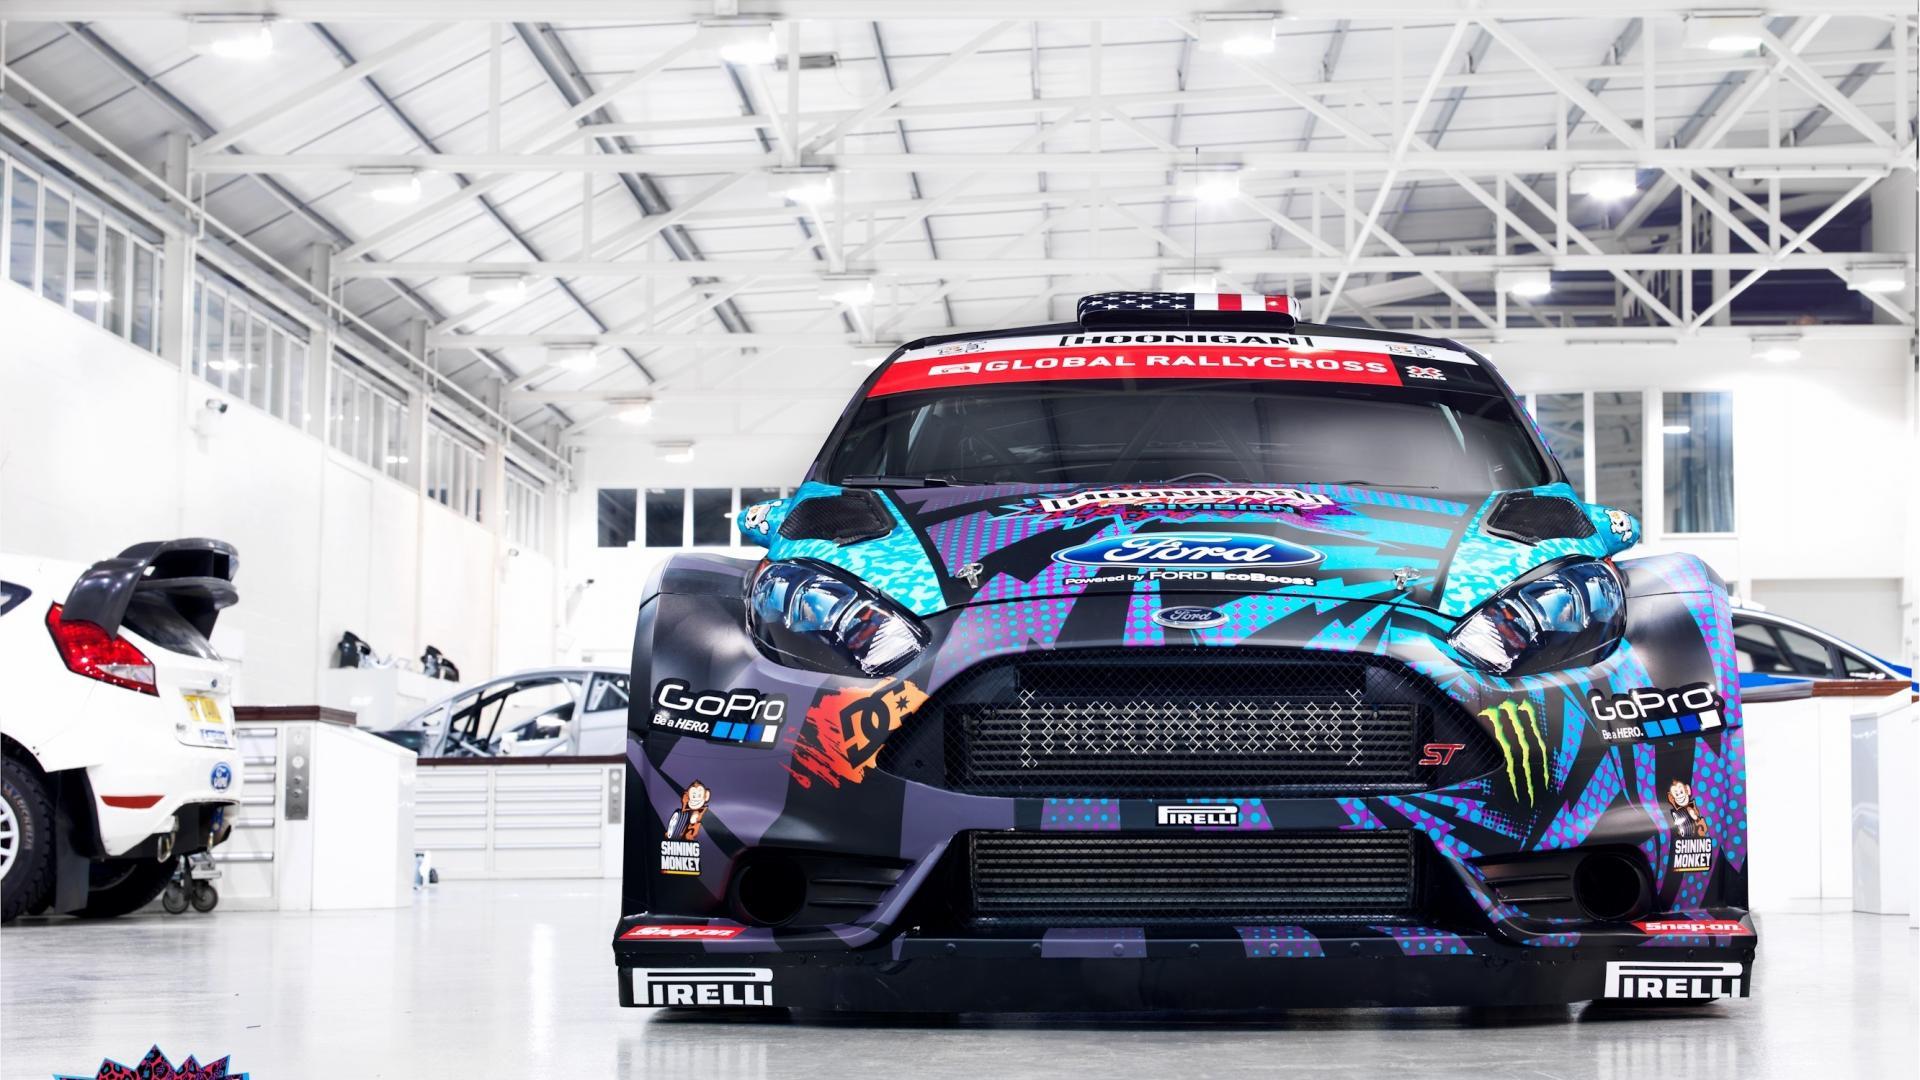 Go pro gopro pirelli racing cars hoonigan wallpaper 67925 1920x1080